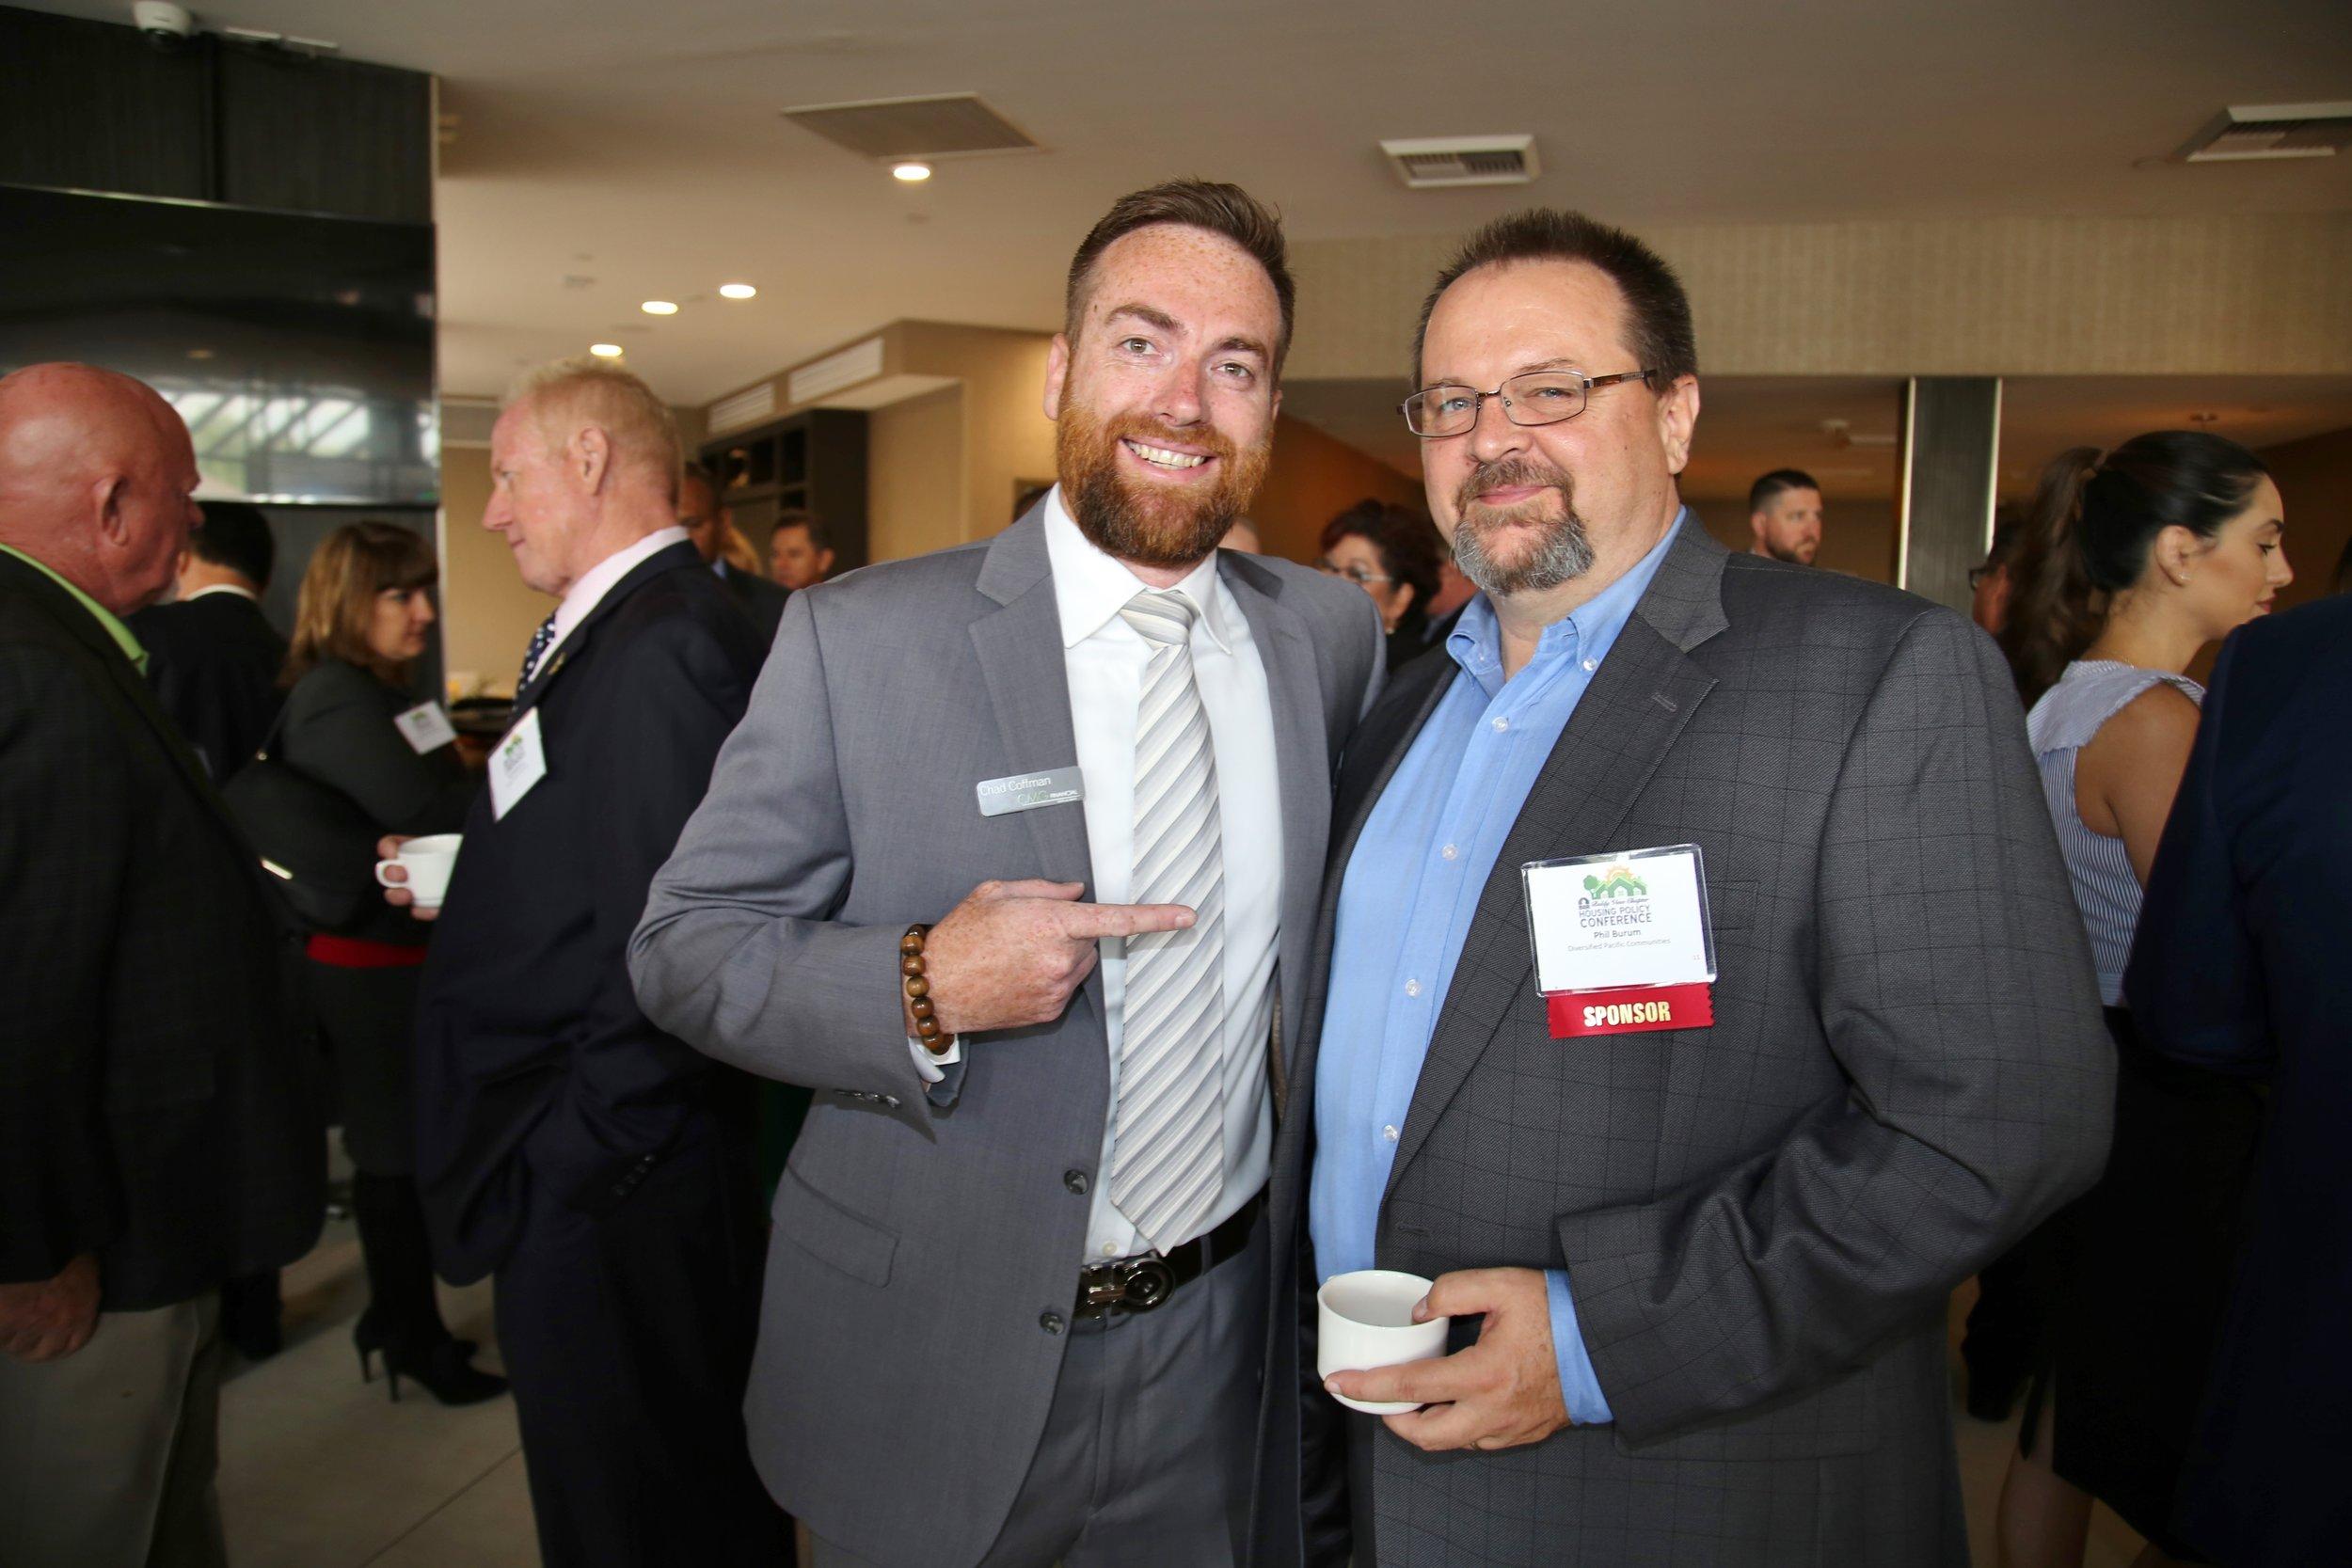 Board Member Chad Coffman of CMG Financial and BIABV President Phil Burum